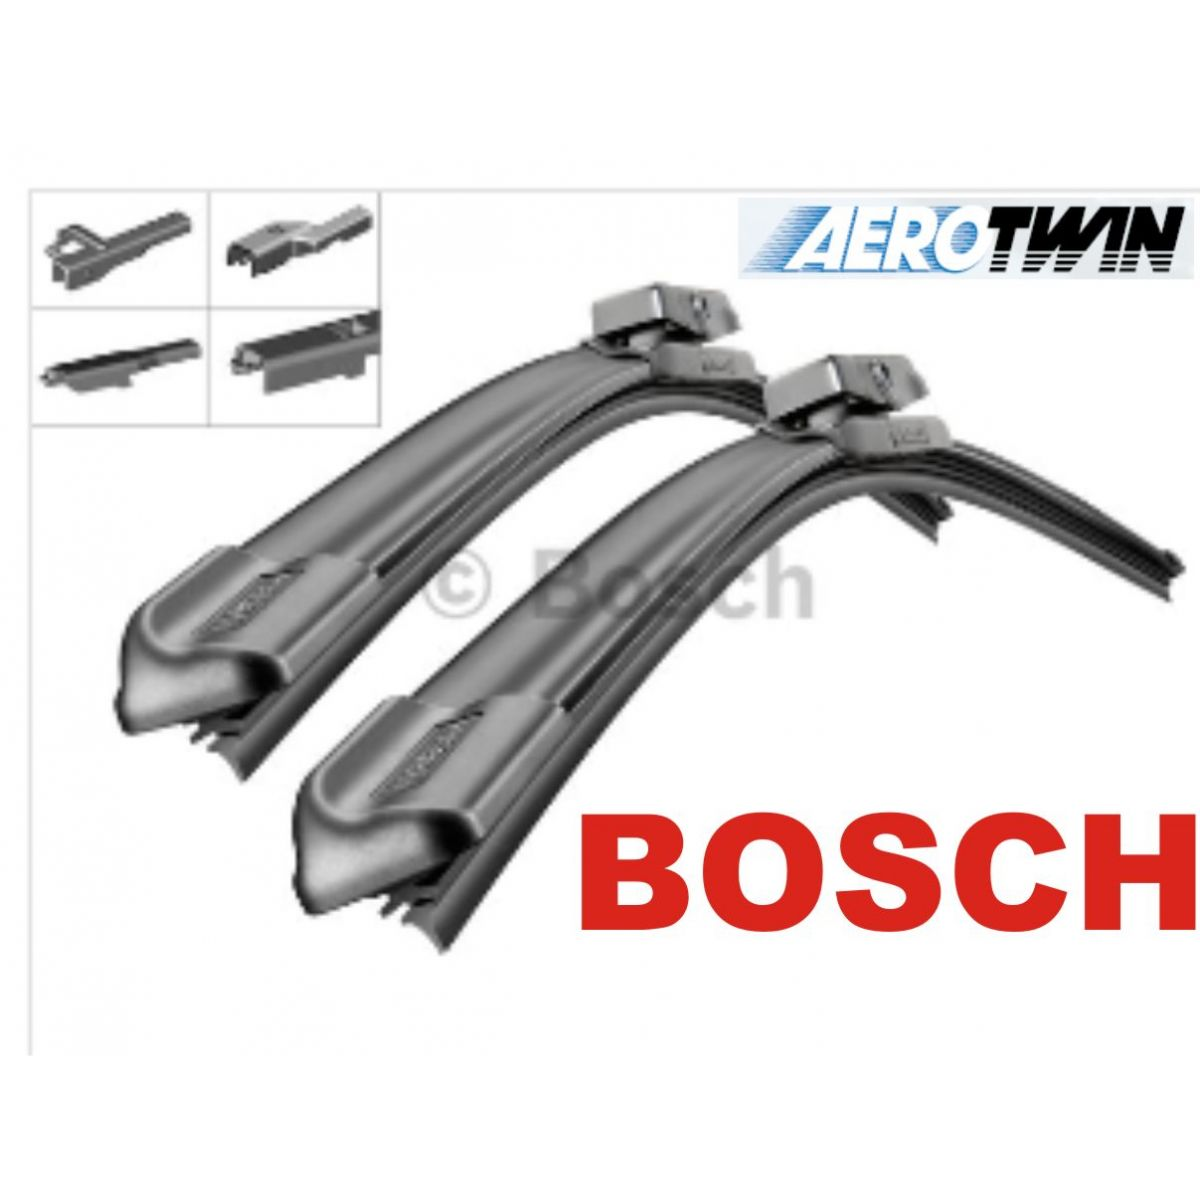 Palheta Bosch Aerotwin Plus  Limpador de para brisa Bosch Audi A4 [8K2, B8] / A4 [8K5, B8] Avant / A5 [8T3] Coupe Sportback / Q5 / RS4 / RS5 / S4 / S5 / SQ5